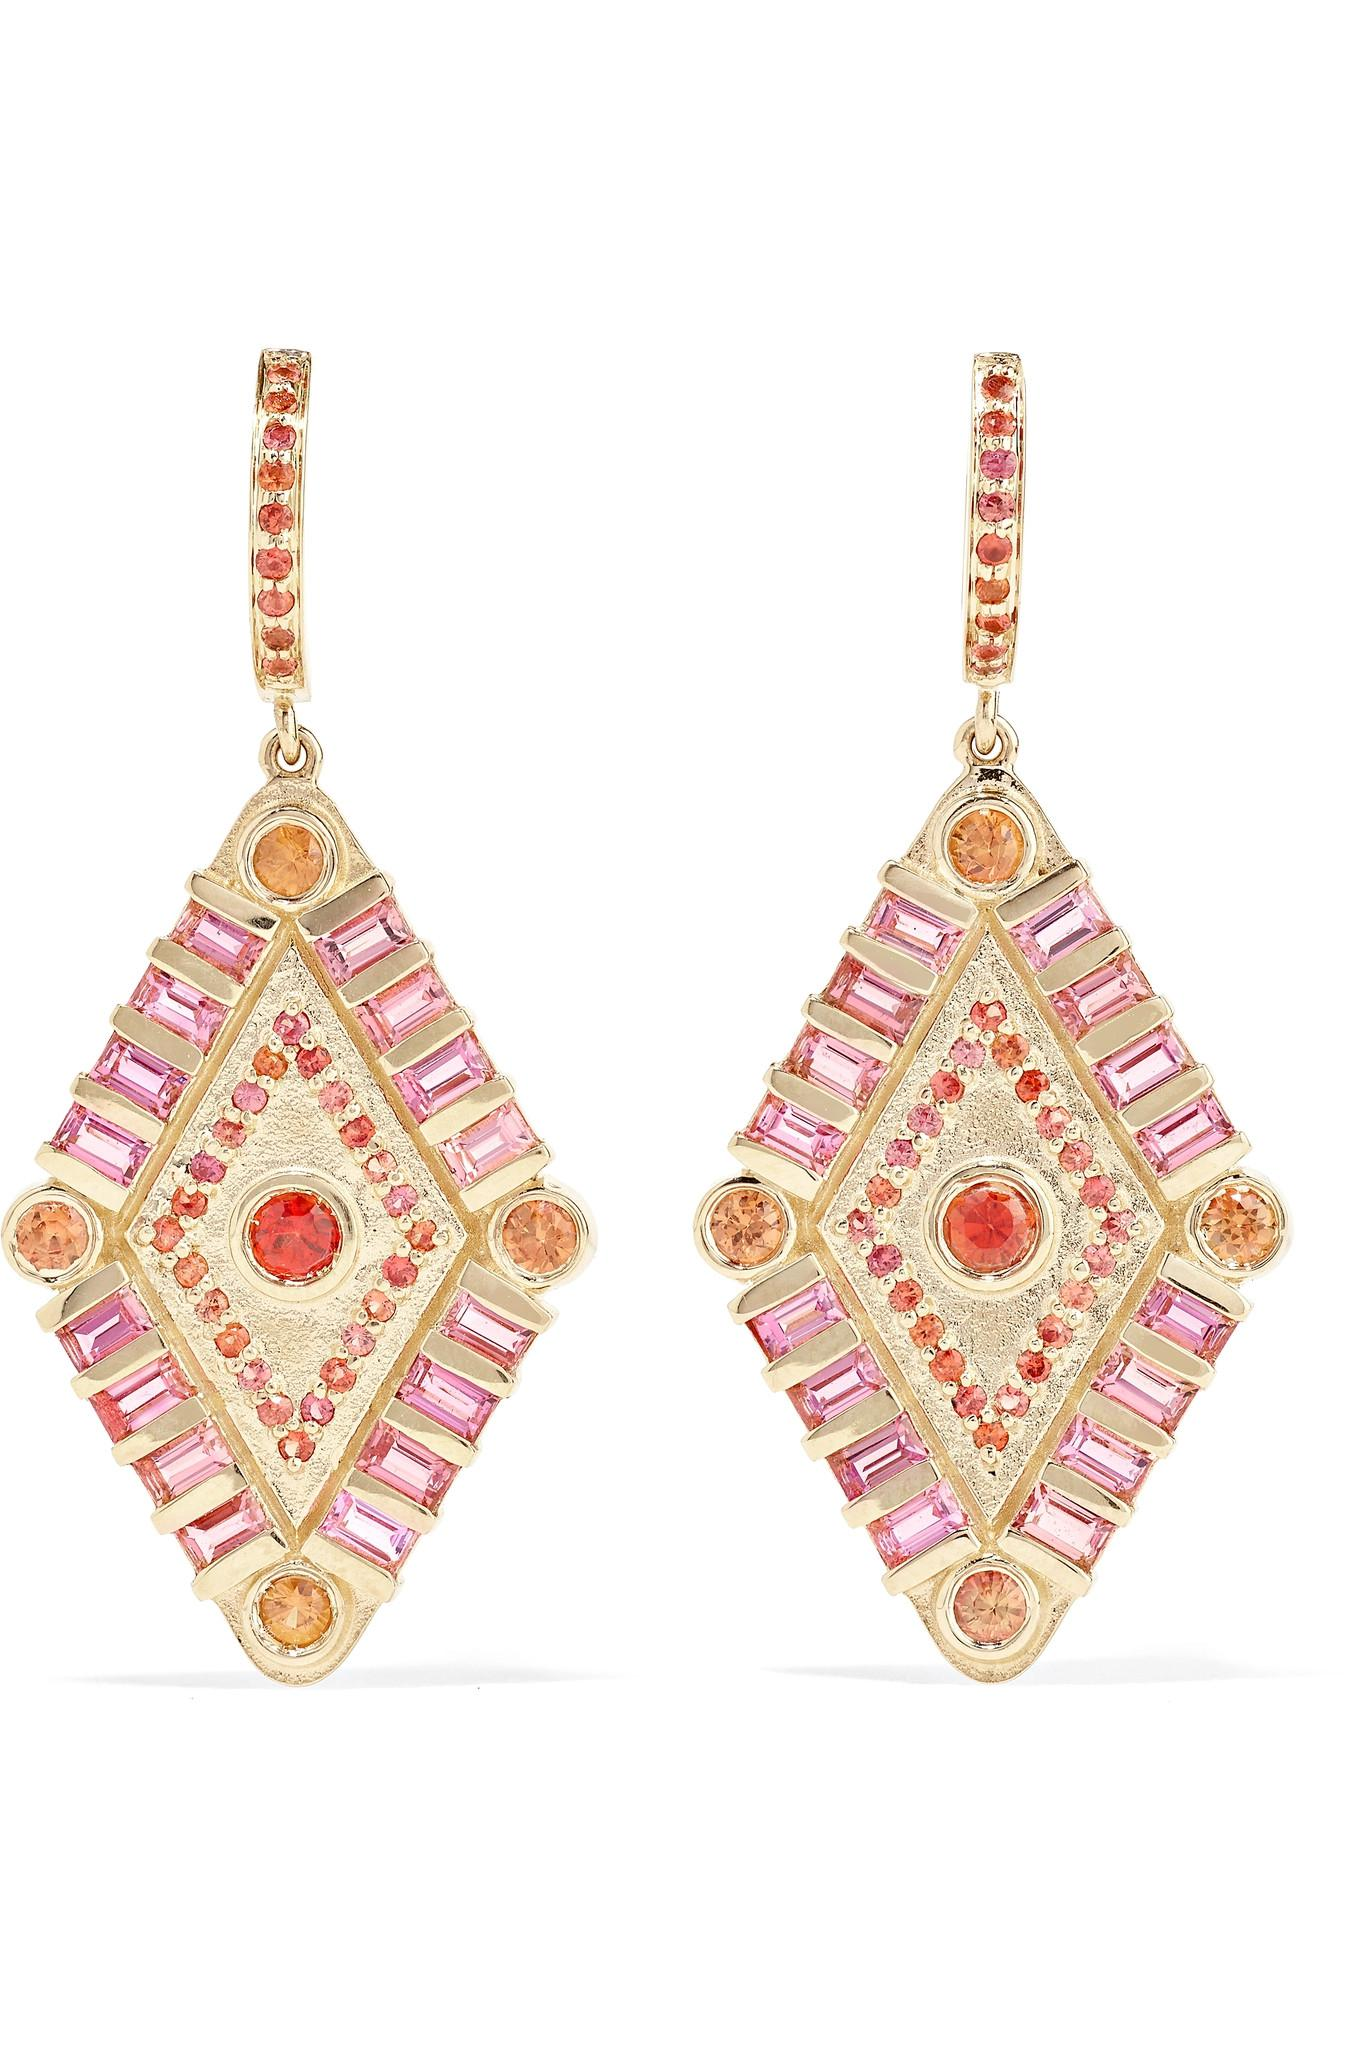 Marlo Laz Shamans Eye 14-karat Gold, Tourmaline And Sapphire Earrings